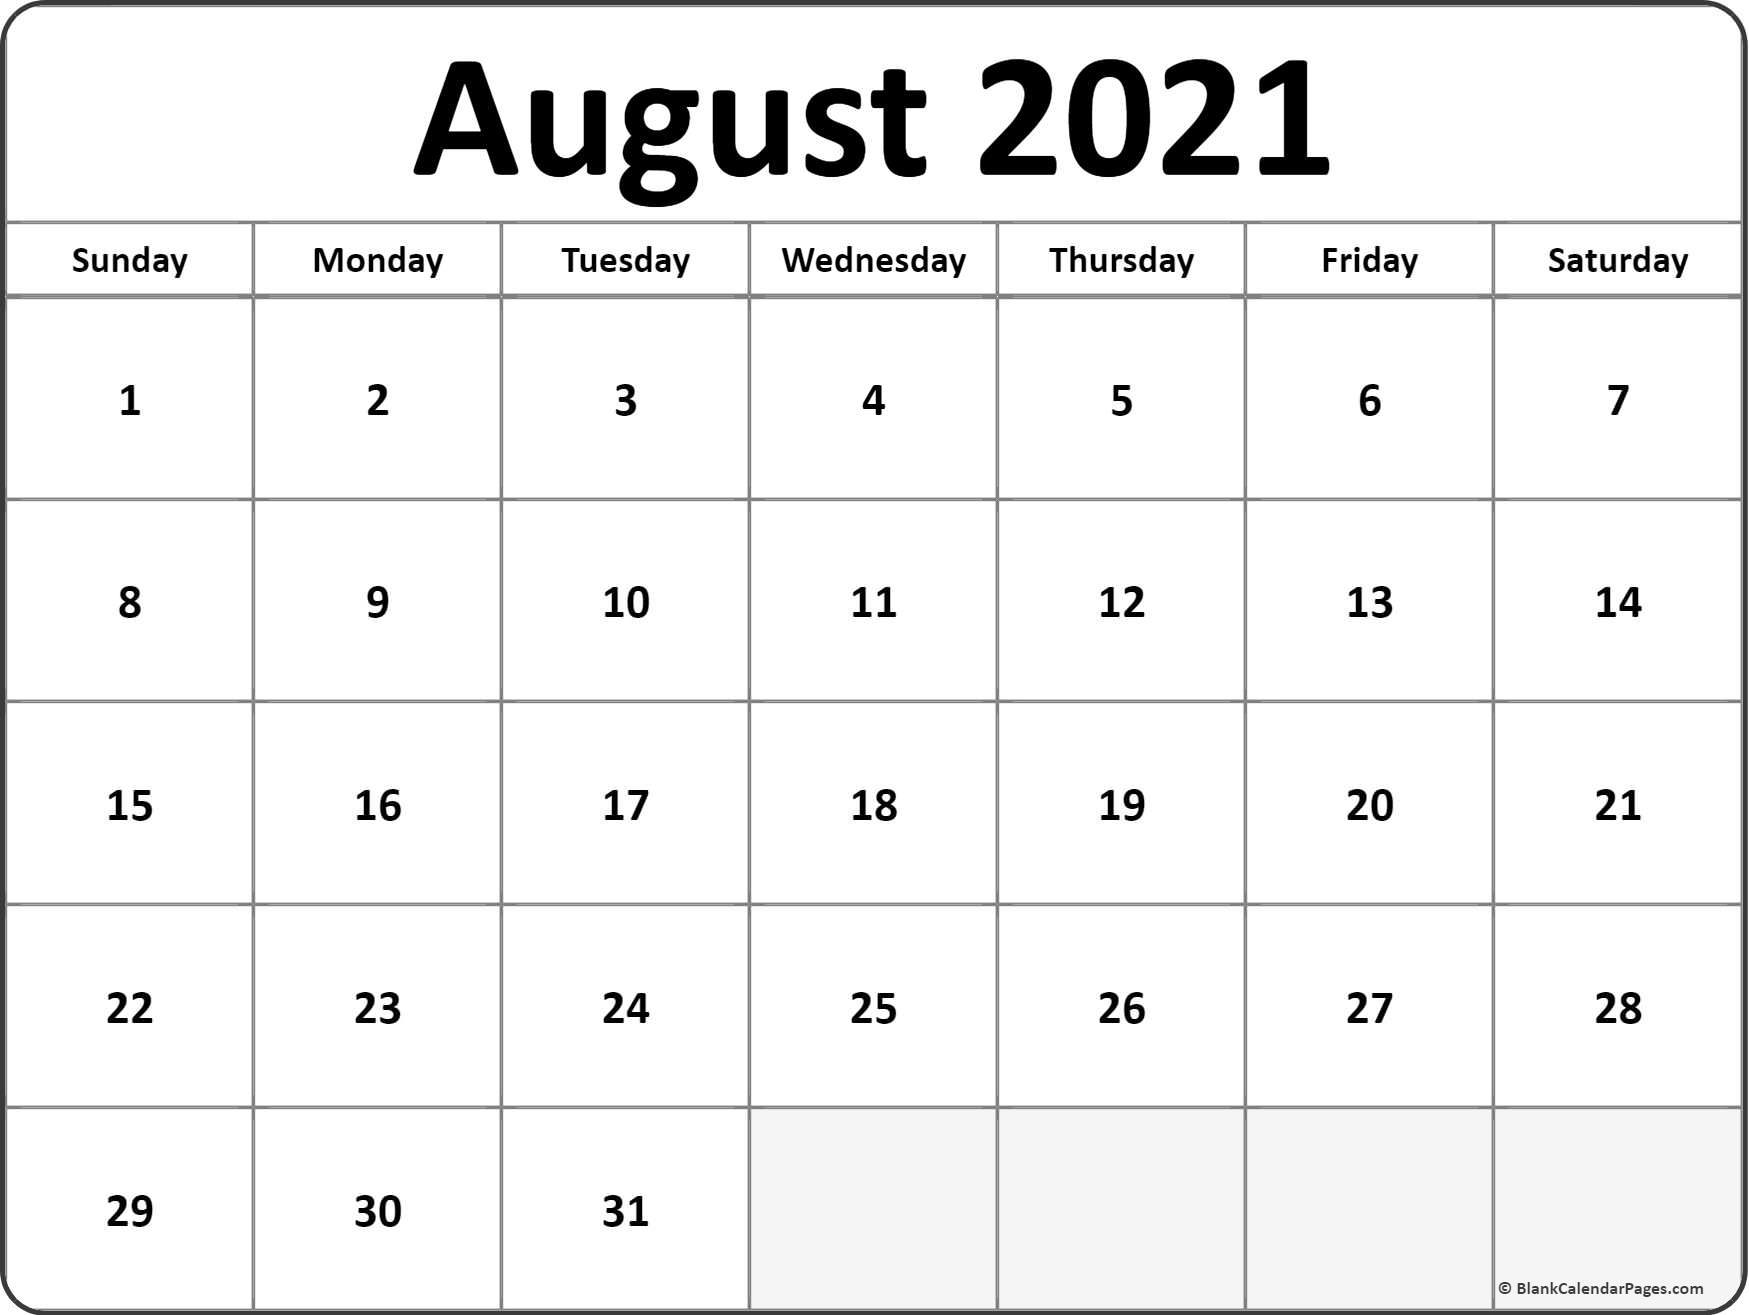 August 2021 Blank Calendar Templates.